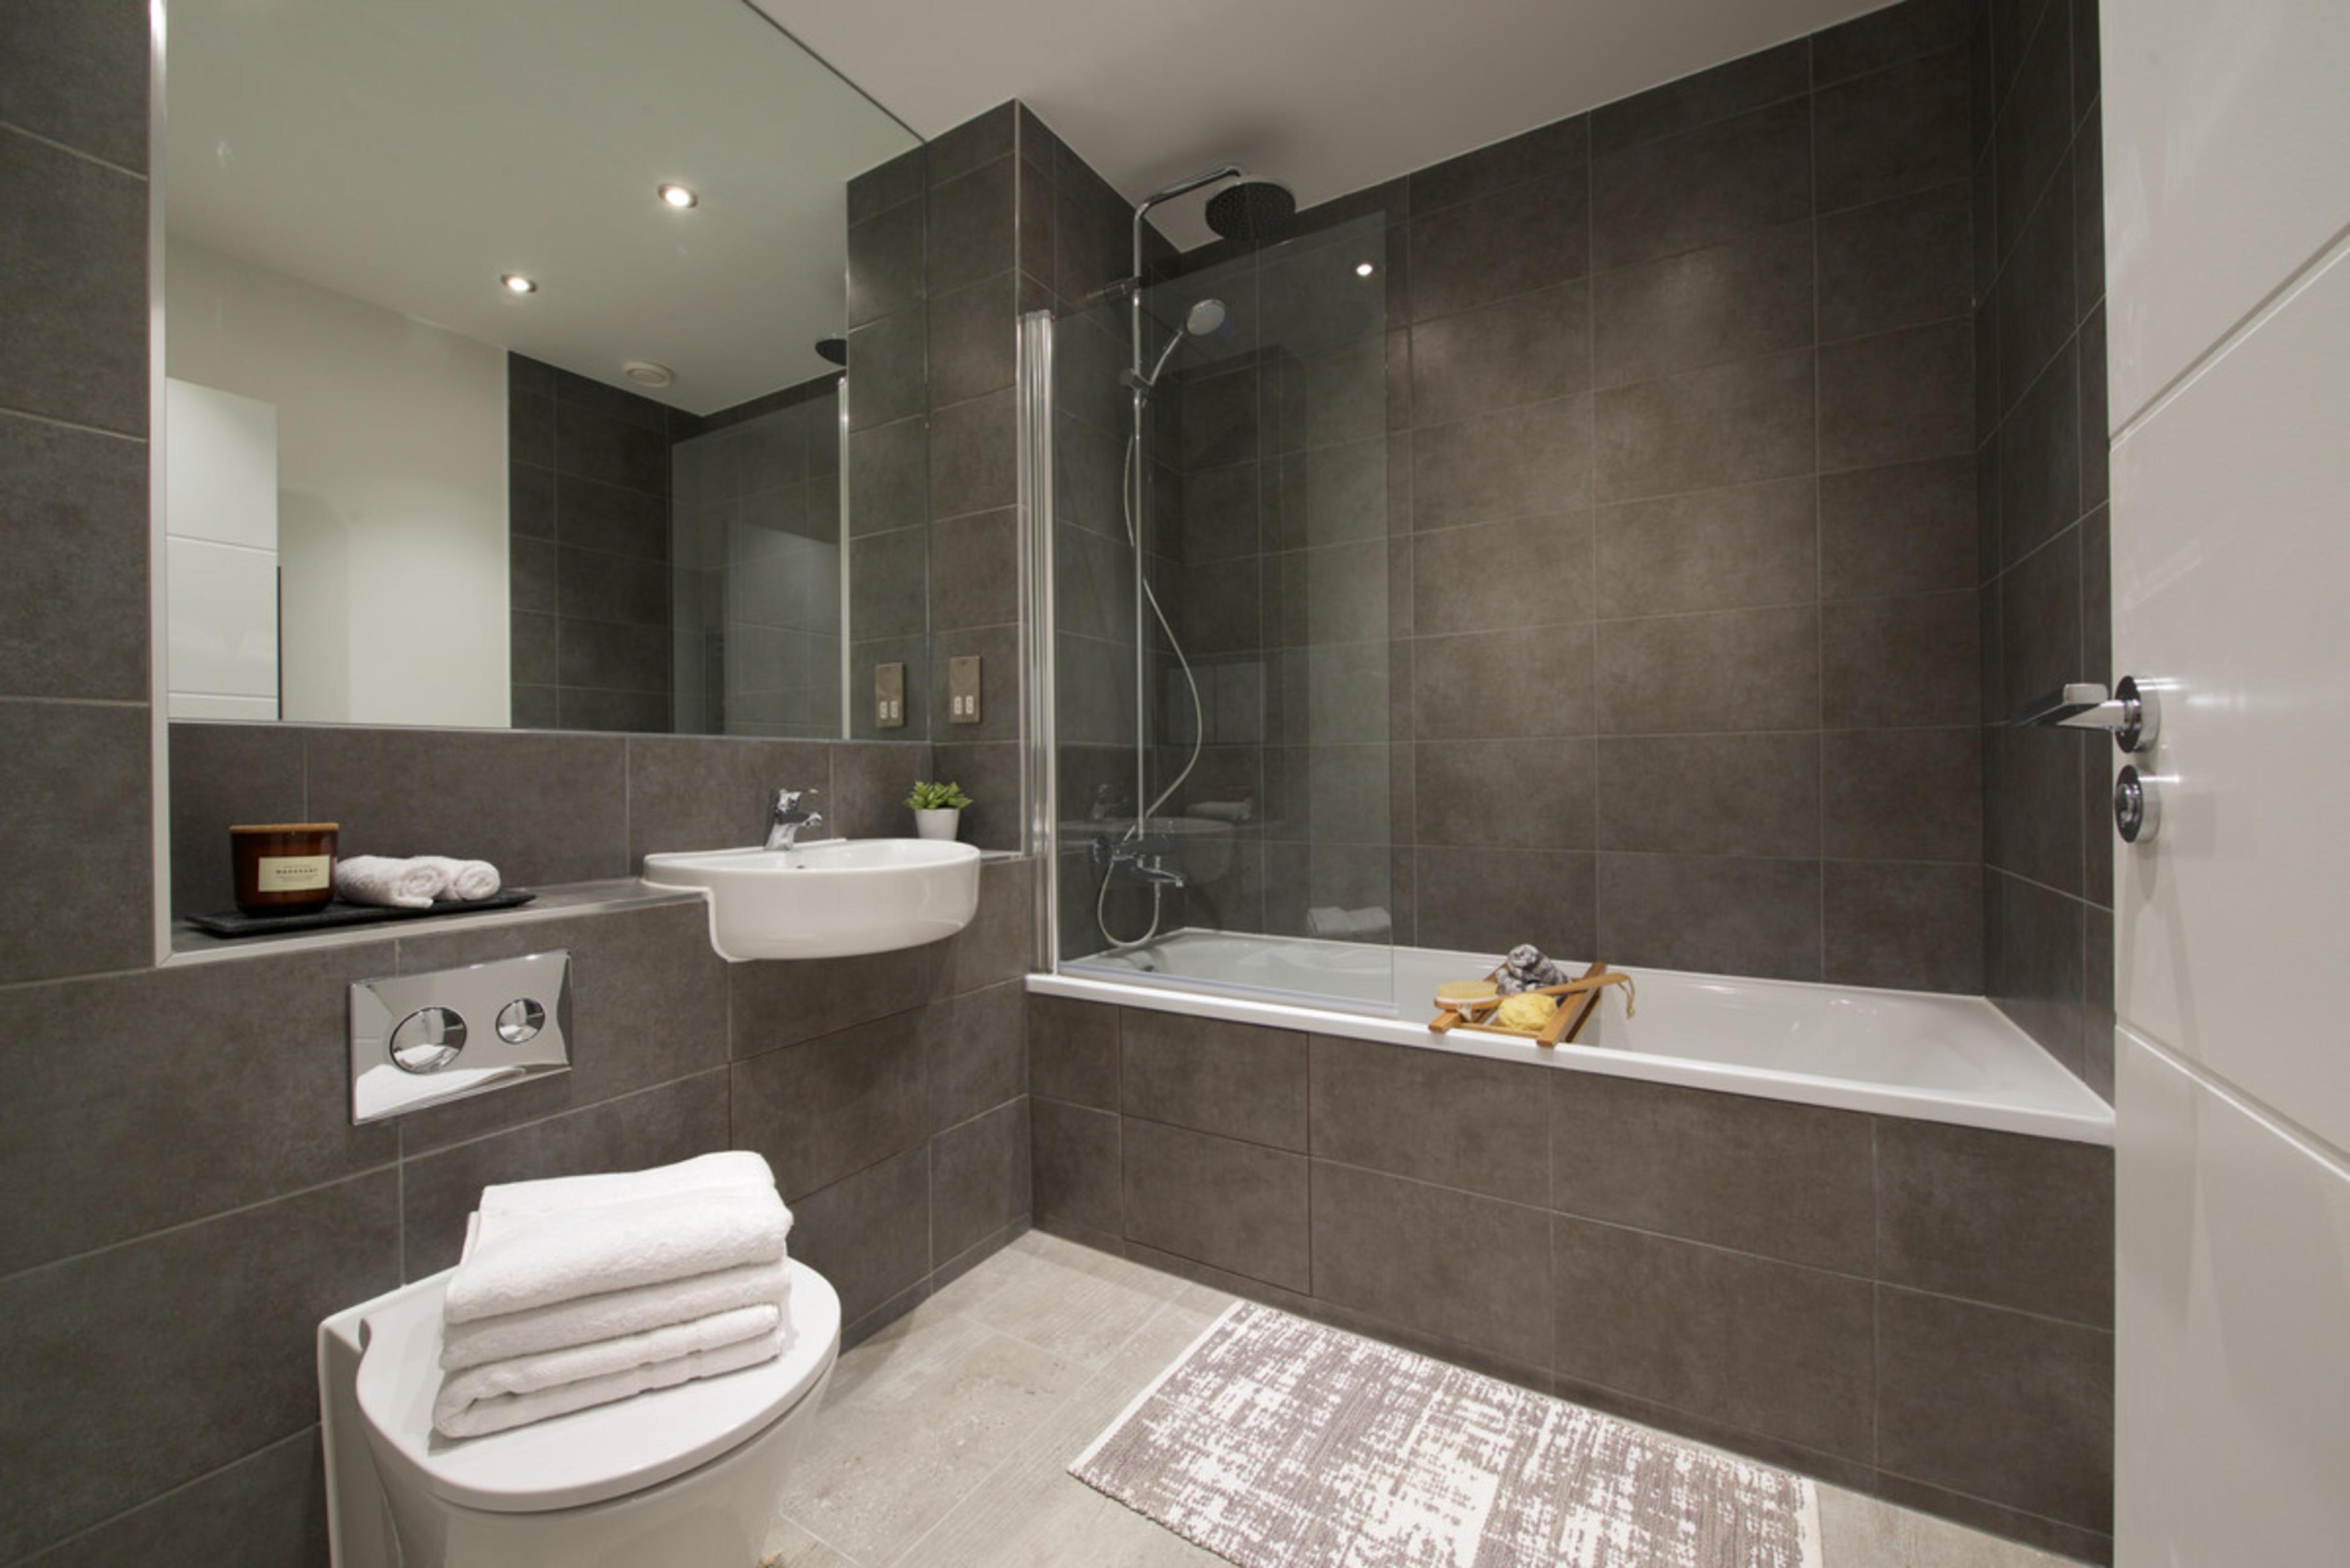 Insignia Place Bathroom